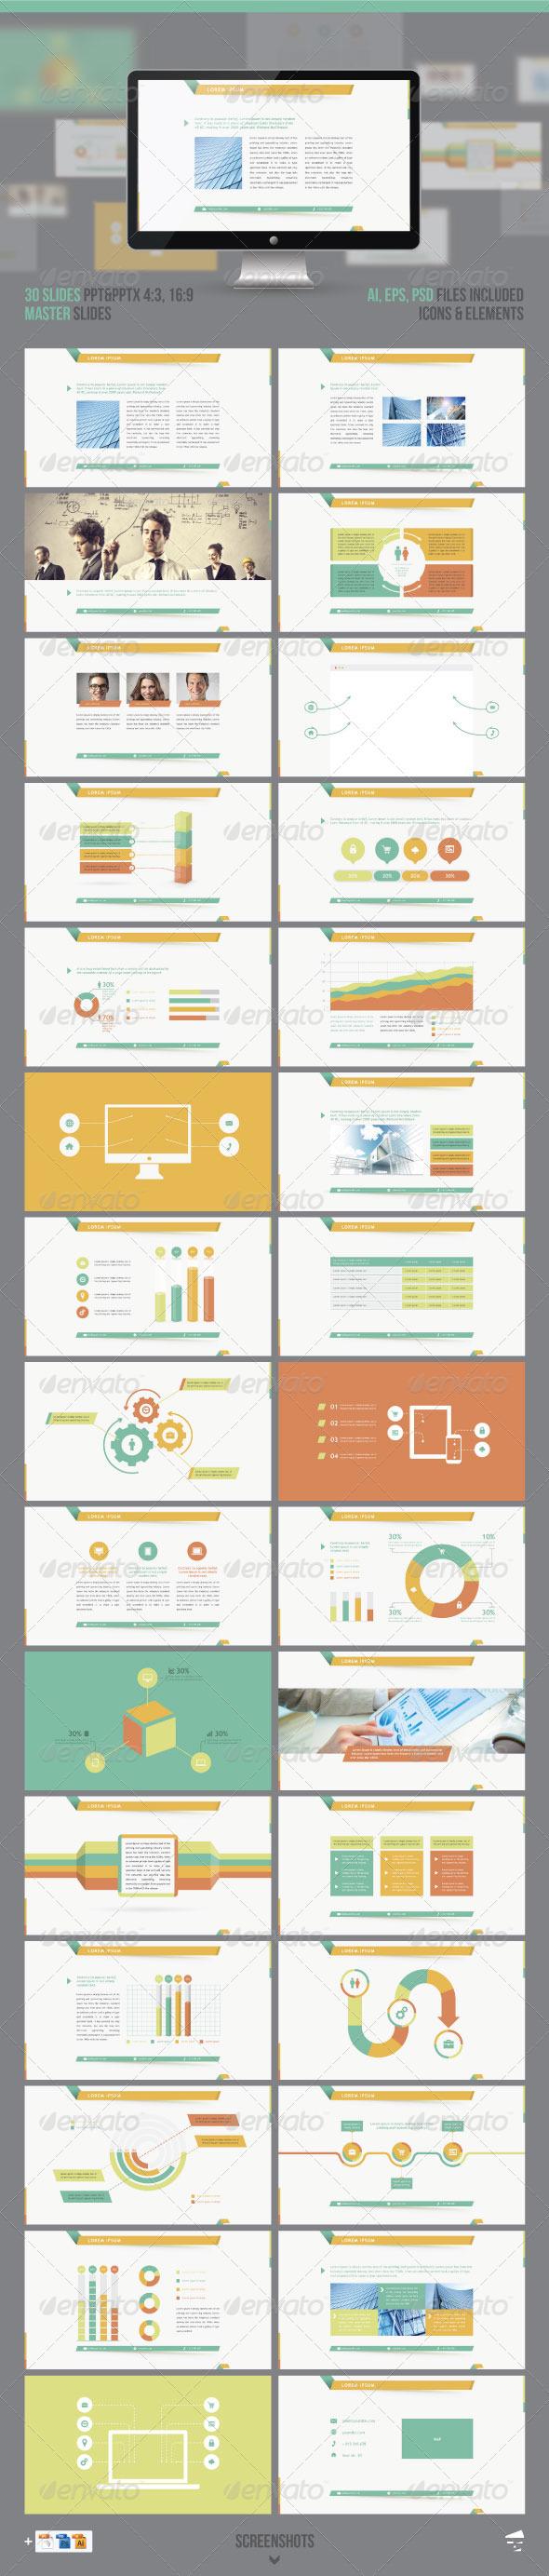 GraphicRiver Infographic Presentation 7530489